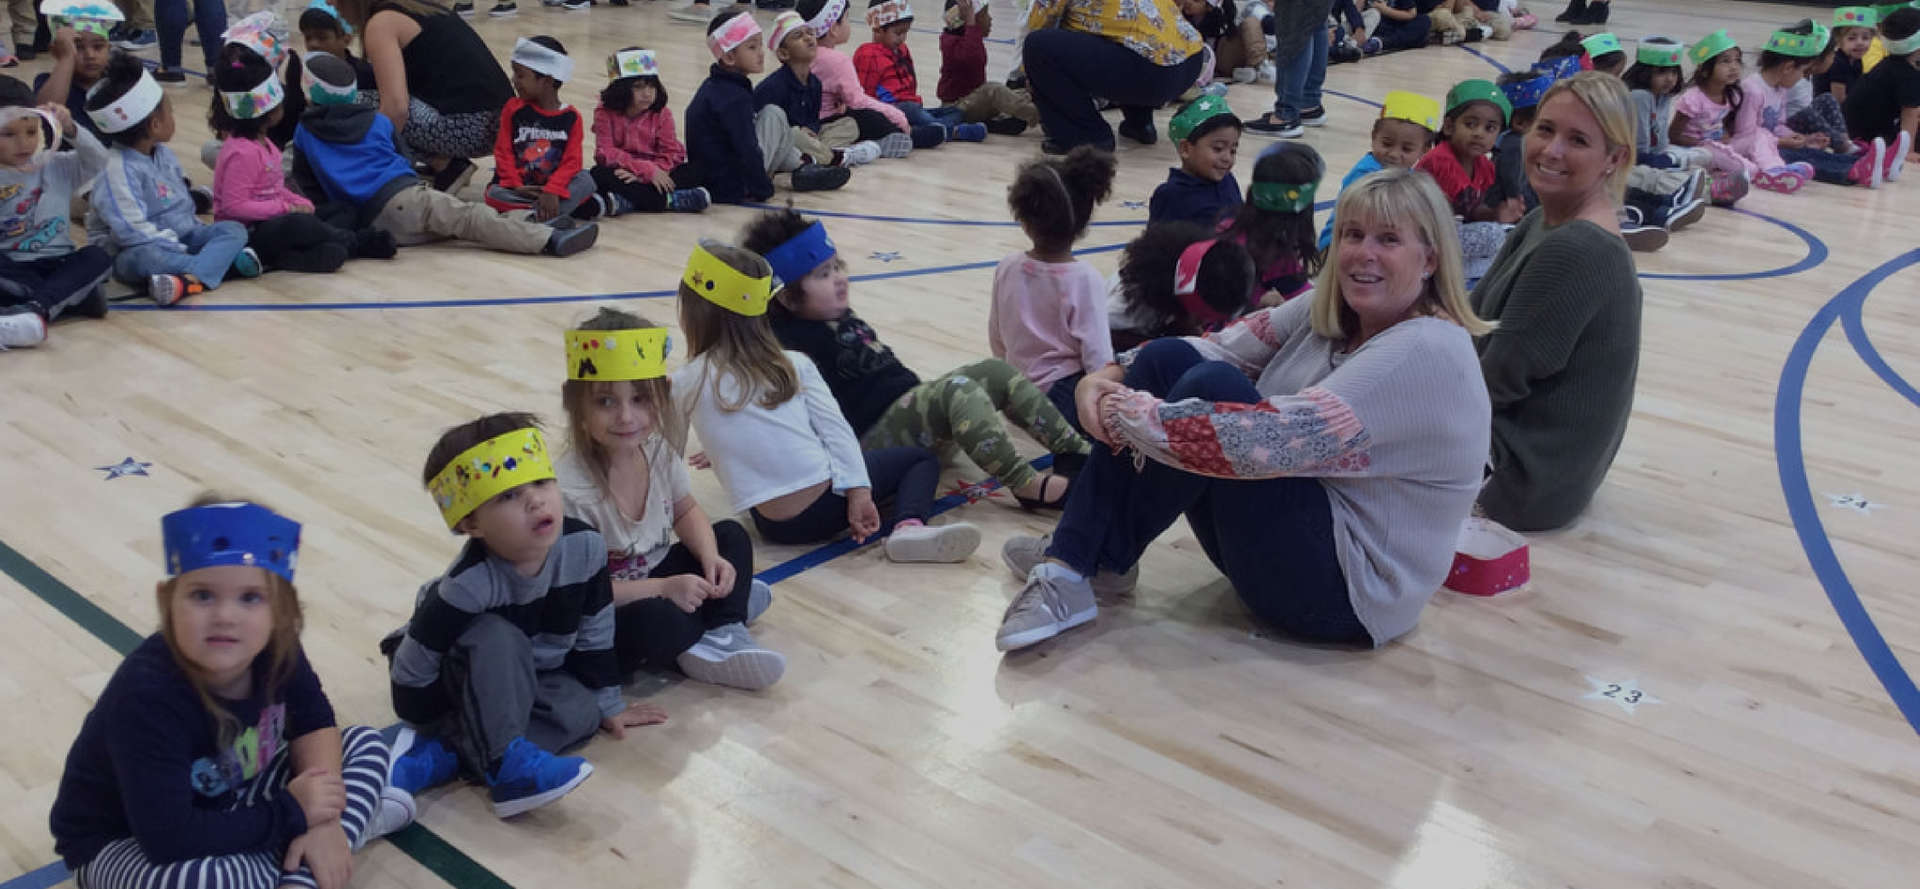 Students and teacher sitting on the gymnasium floor